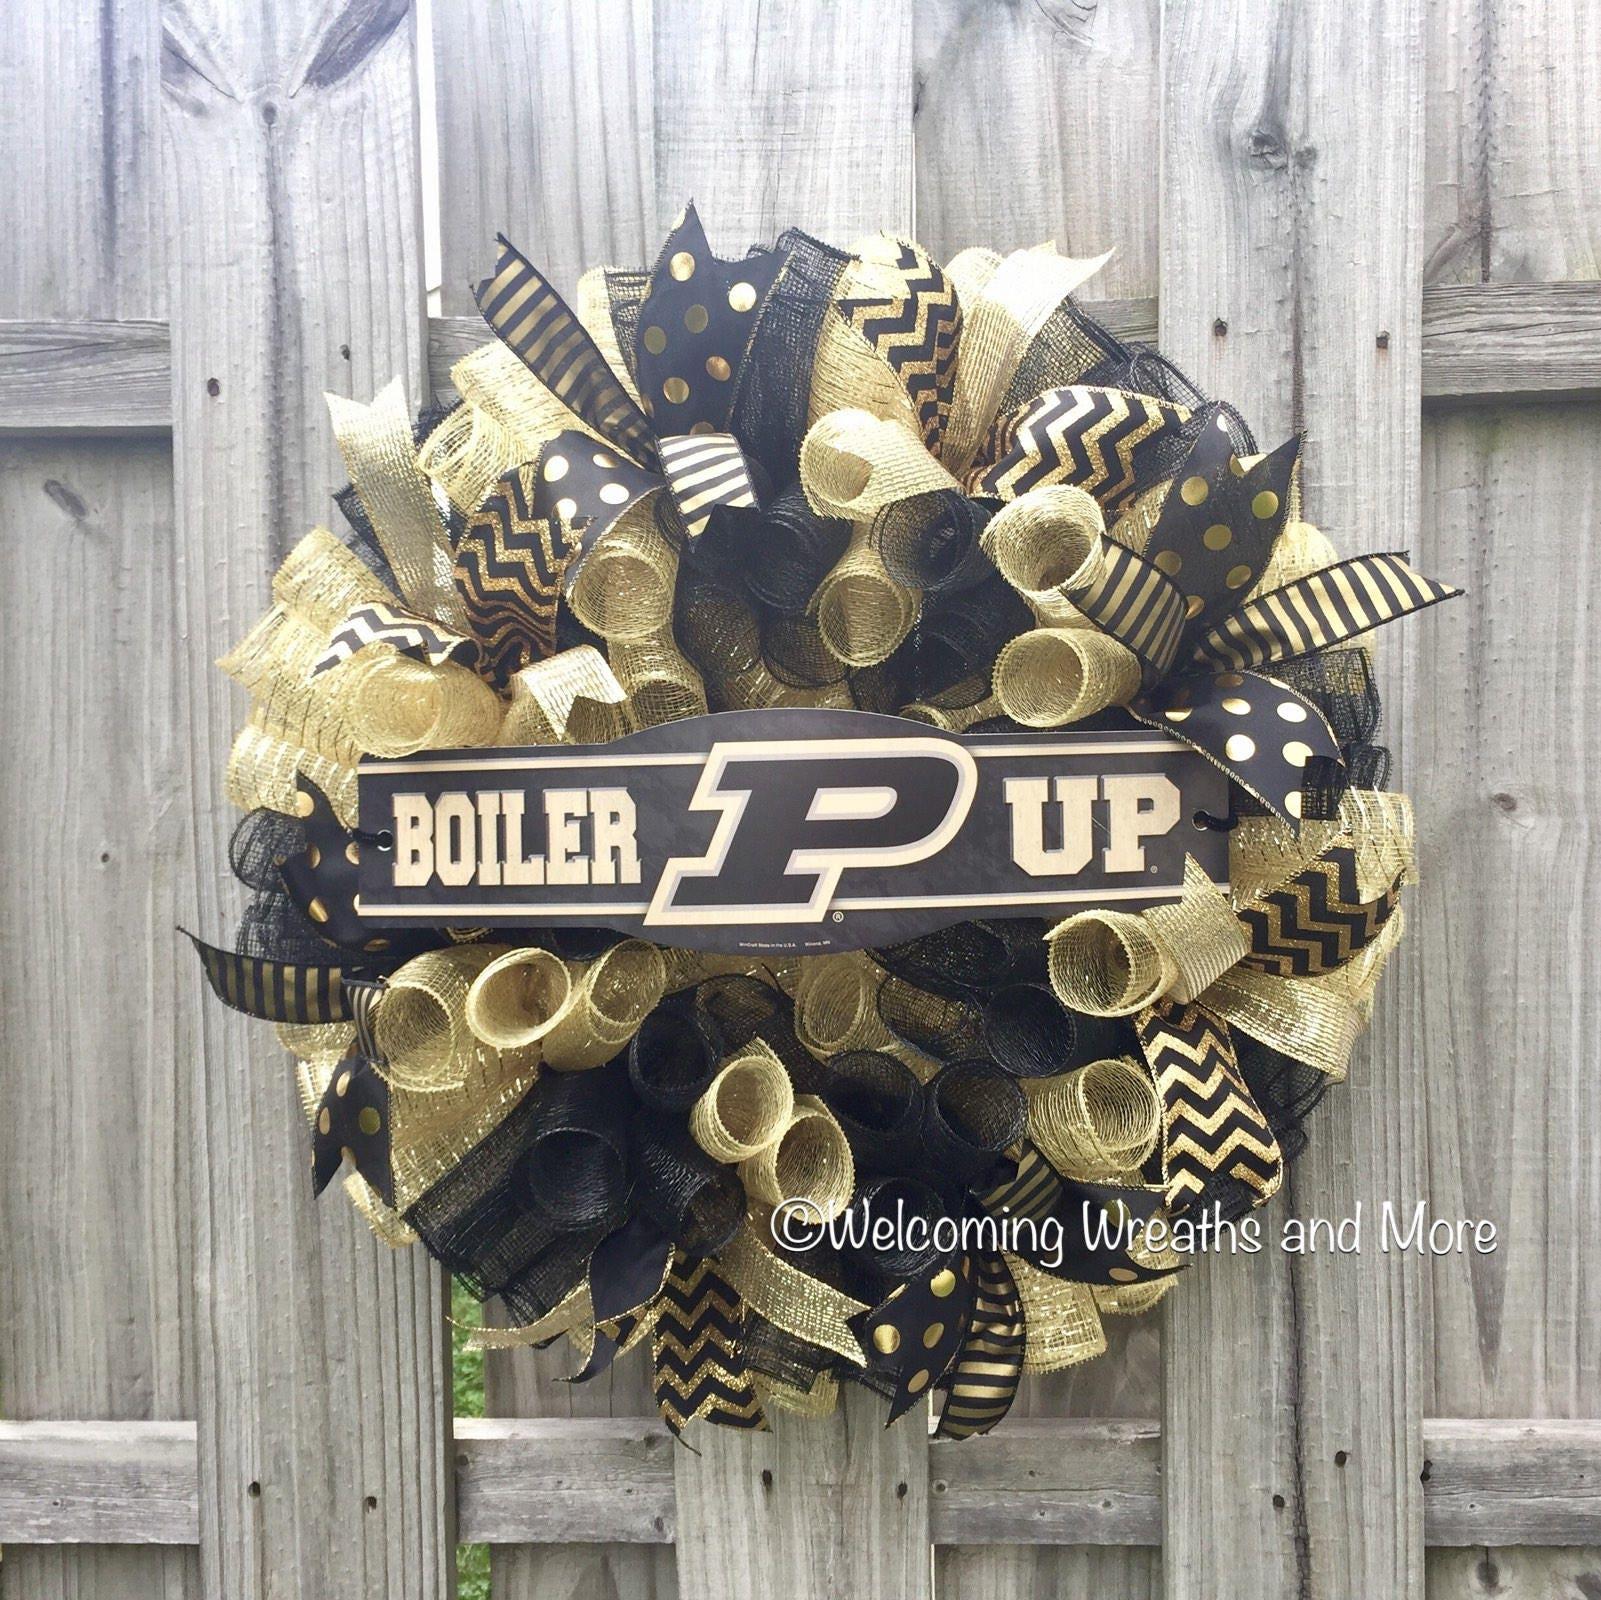 Color printing purdue - Purdue Boilermakers Wreath Purdue Deco Mesh Wreath Purdue Decor